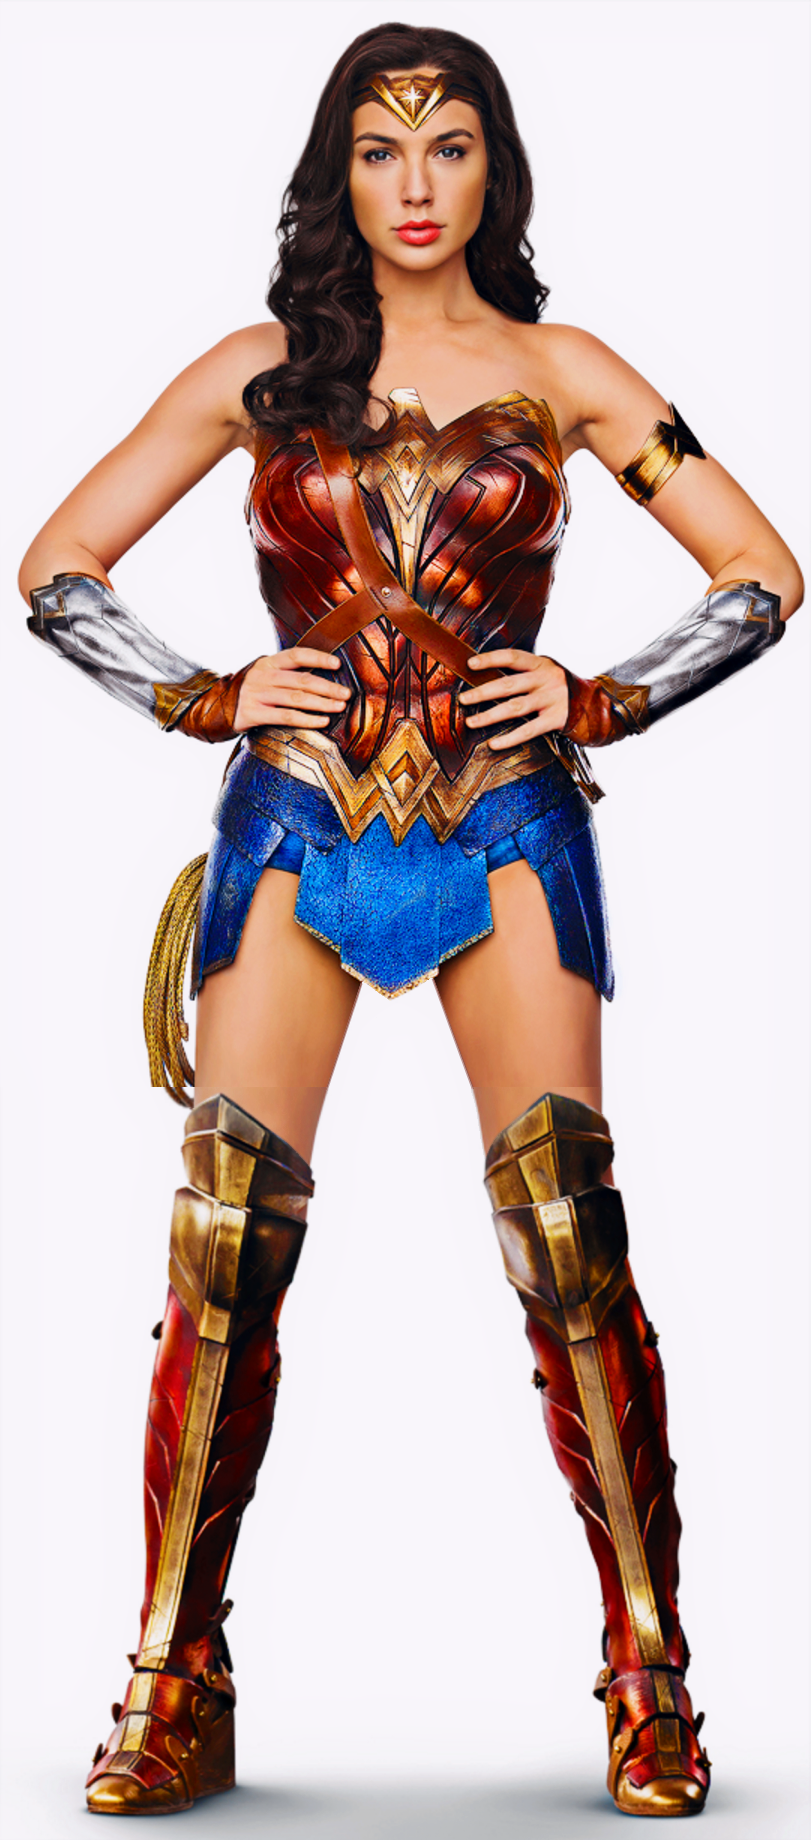 Gal Gadot As Wonder Woman Wonder Woman Wonder Woman Quotes Wonder Woman Artwork